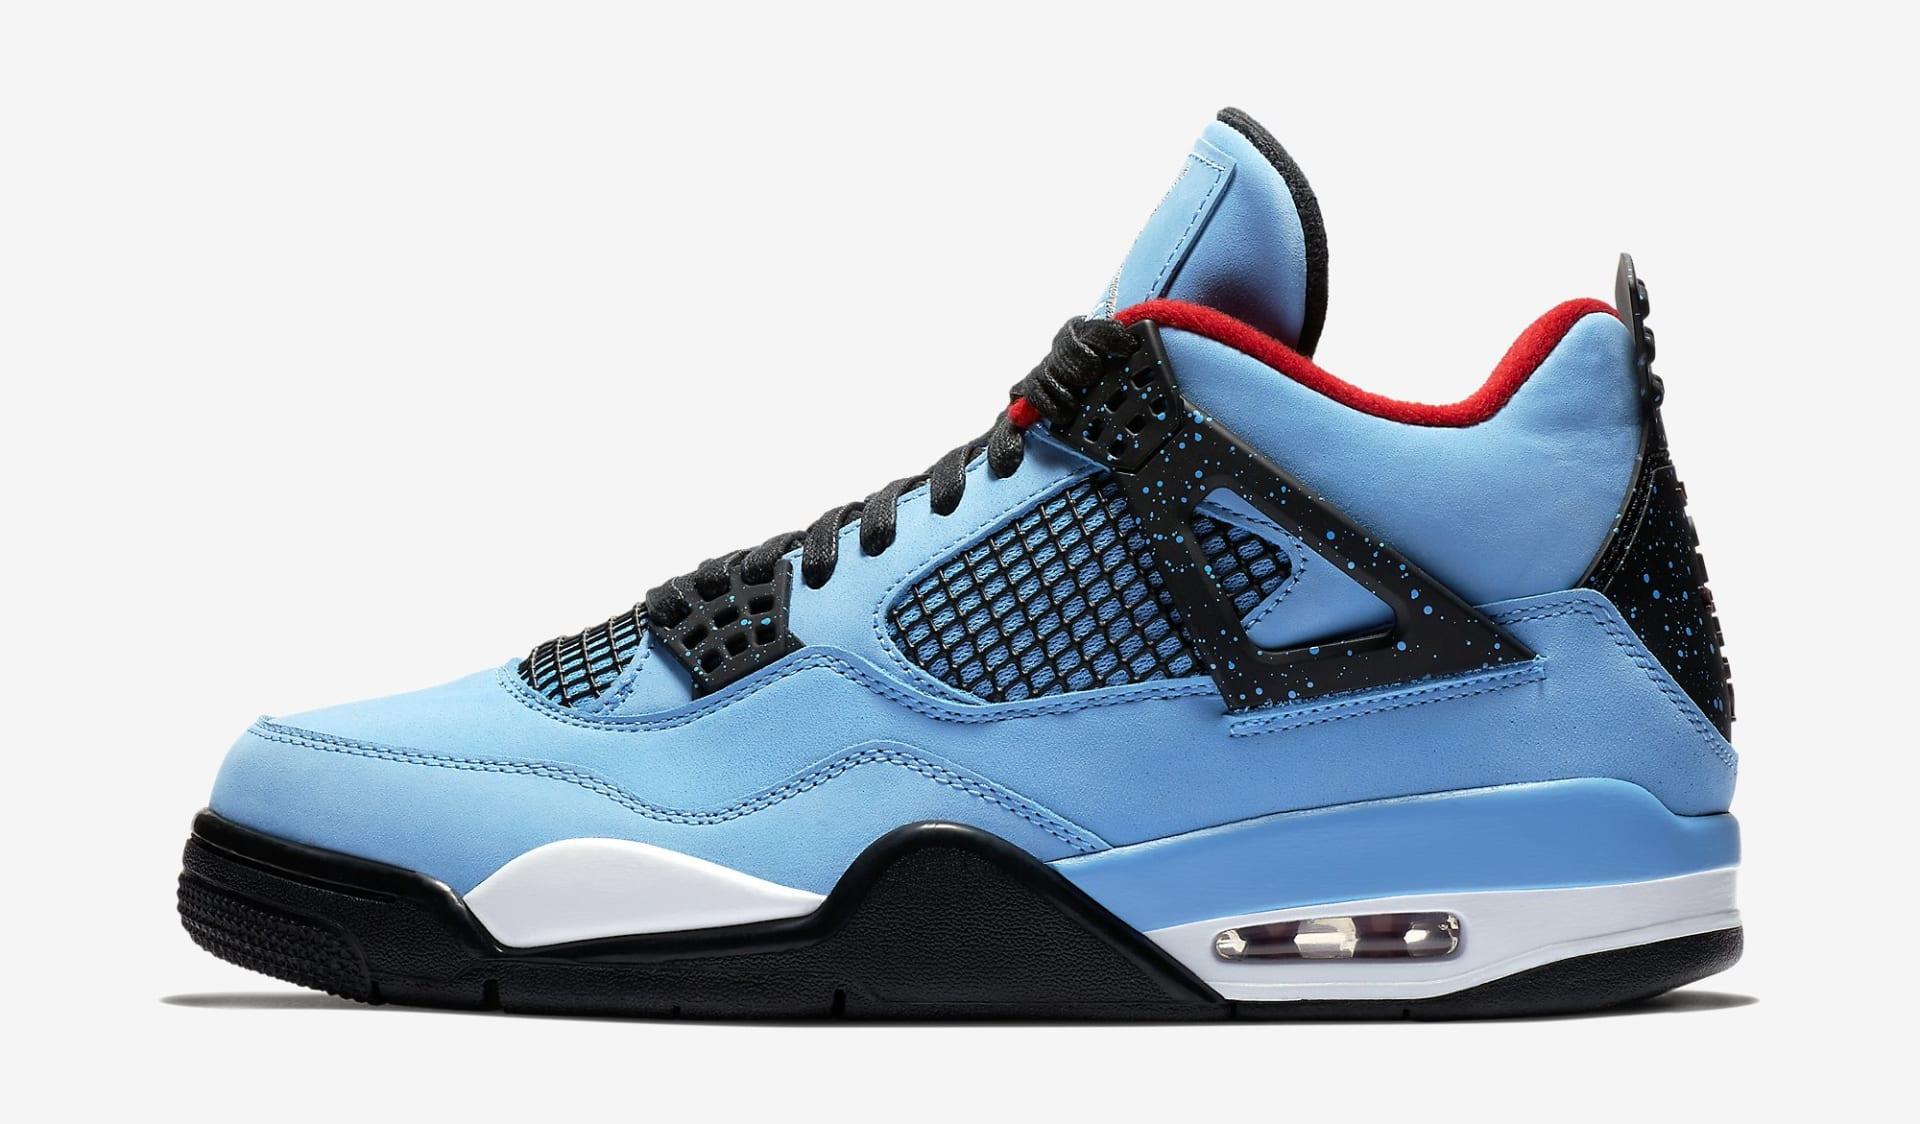 6263e0e8a85e51 The Best Air Jordans of 2018